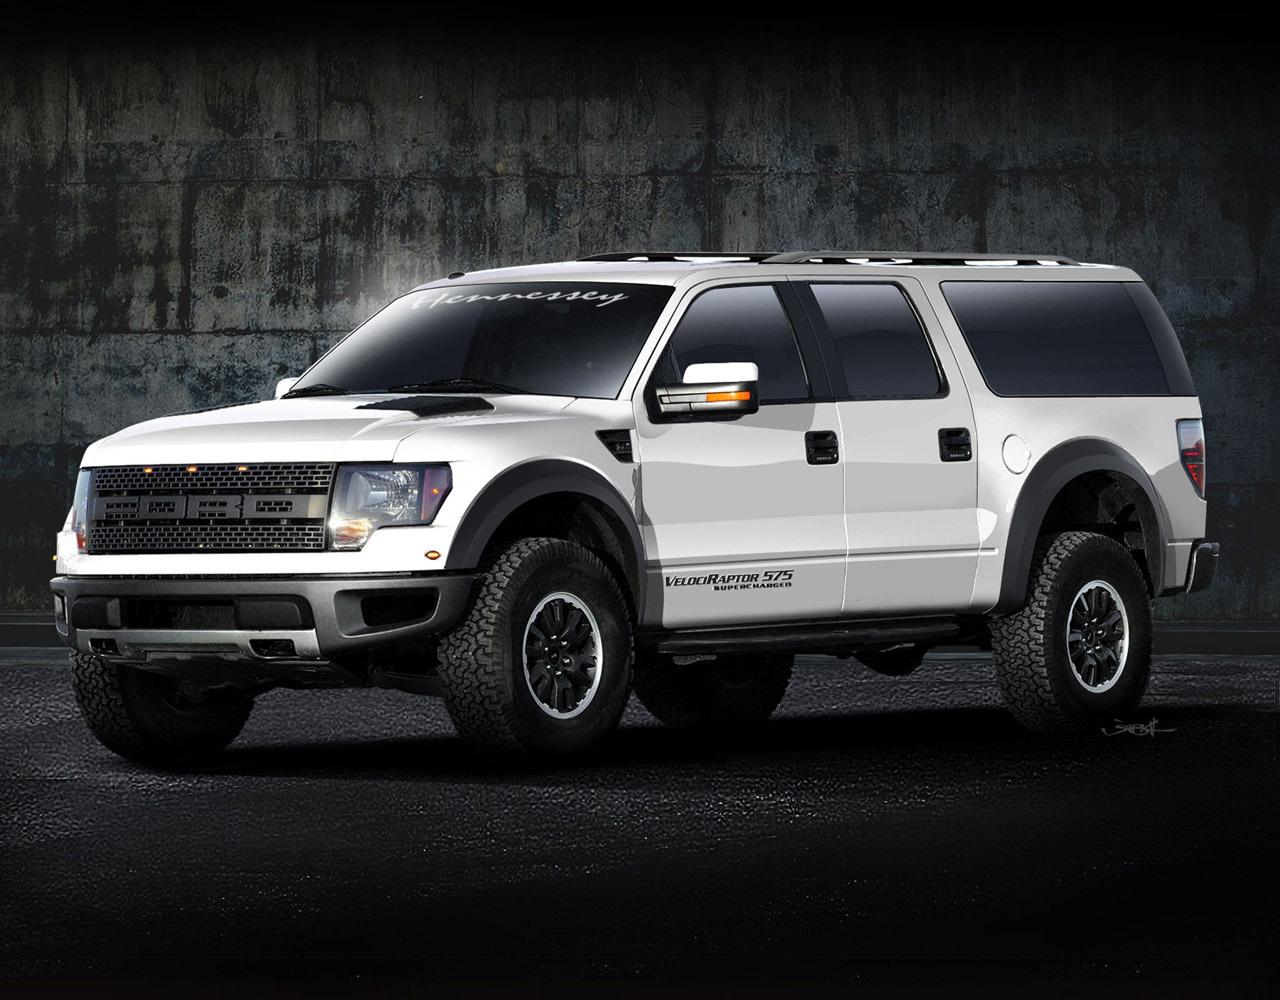 Nissan Patrol, Range Rover